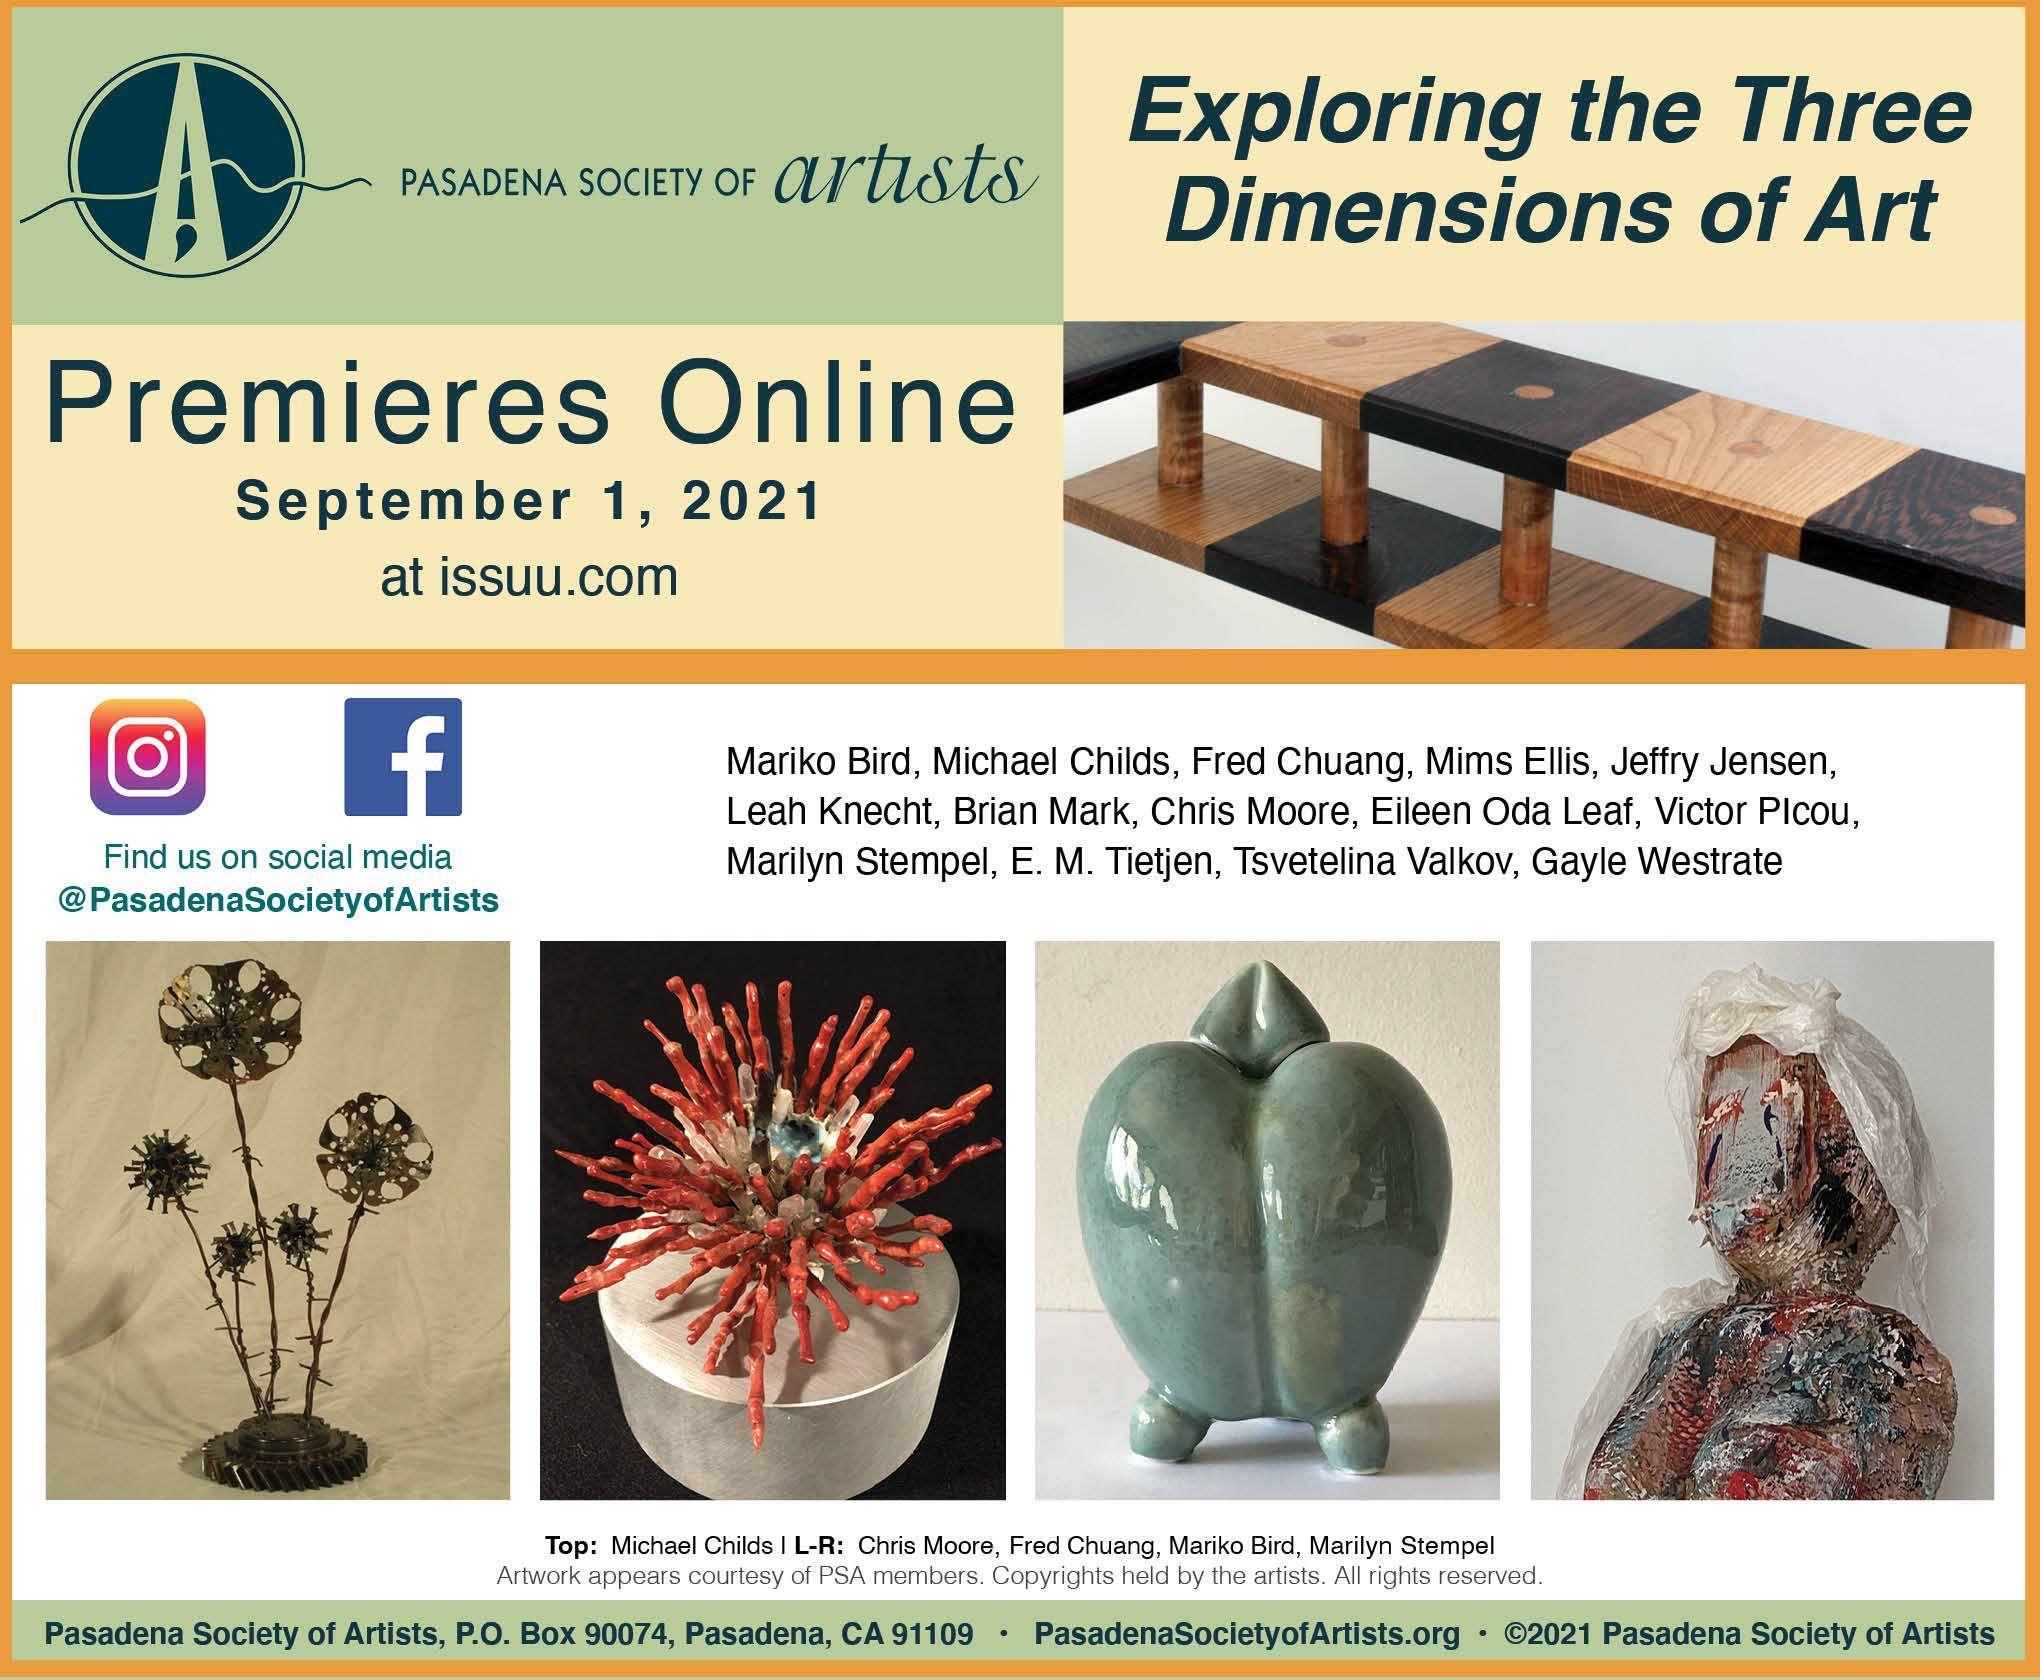 Exploring the Three Dimensions of Art